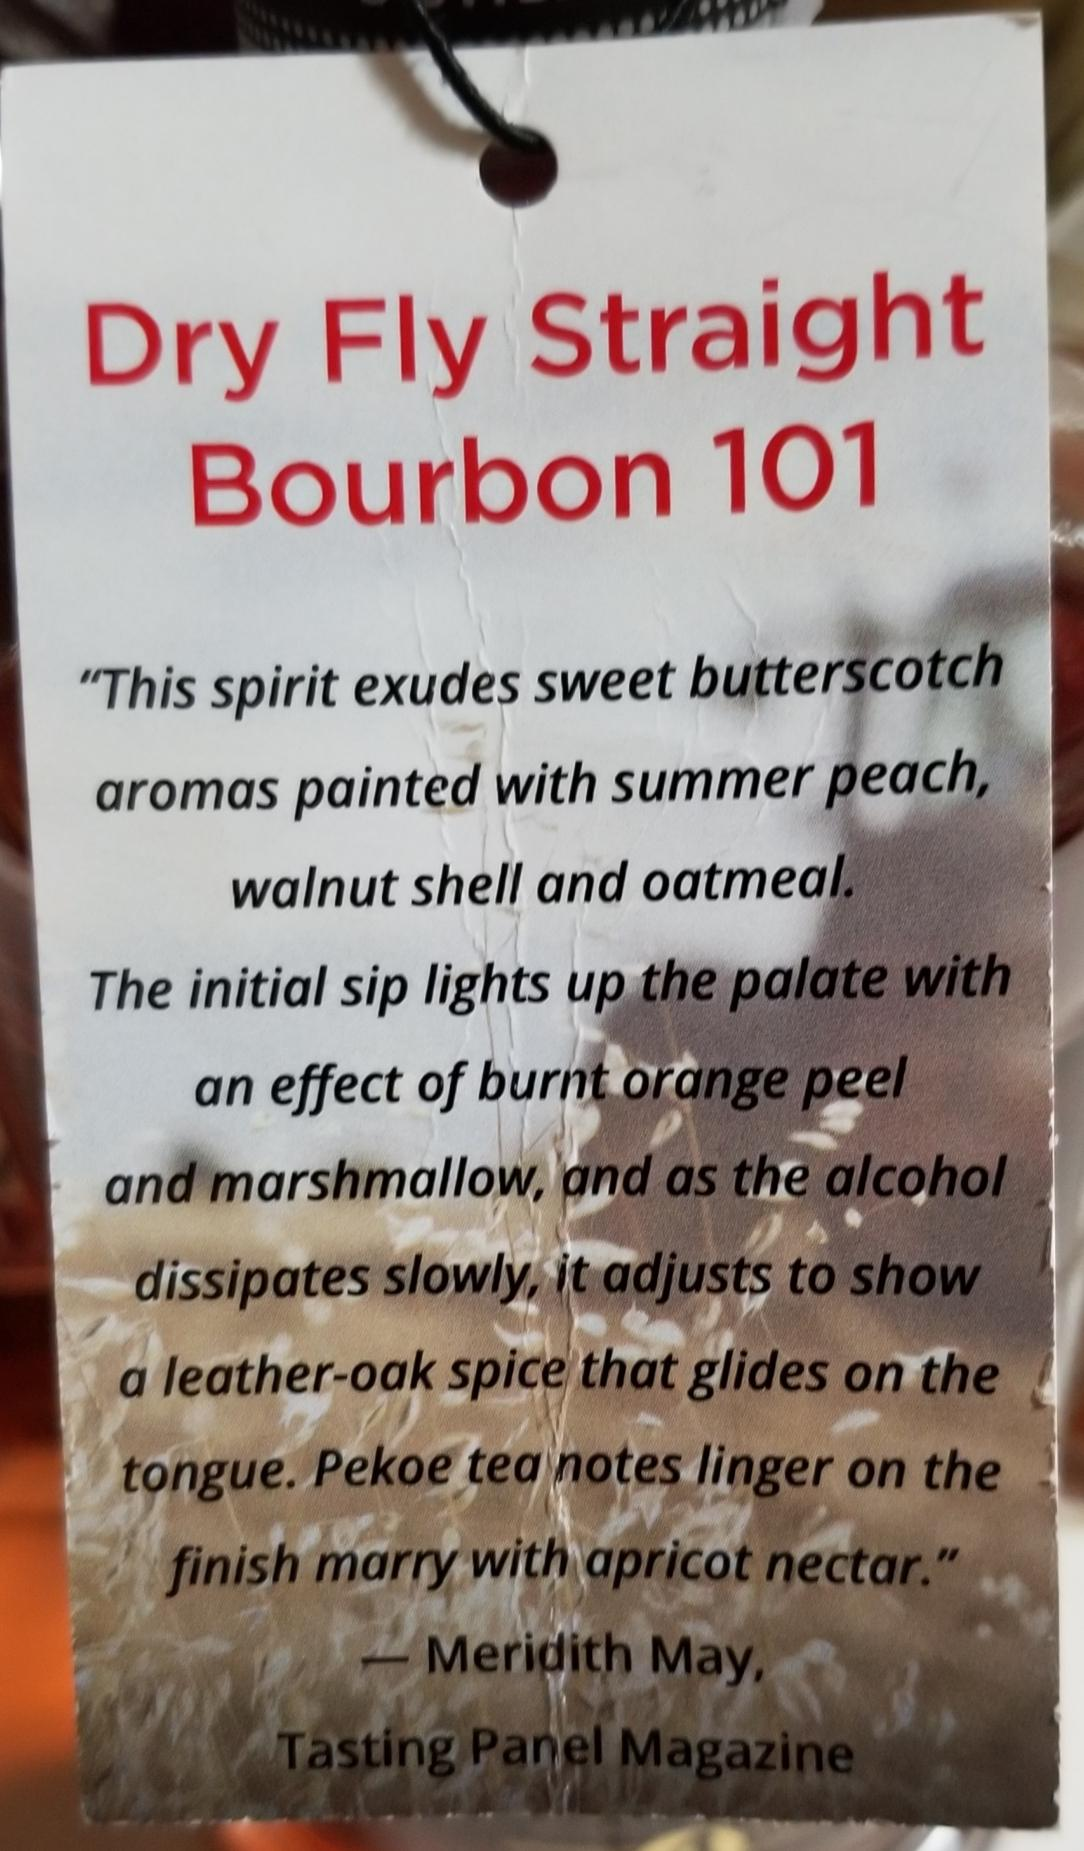 Dry fly staright bourbon 101 2 of 2.jpg